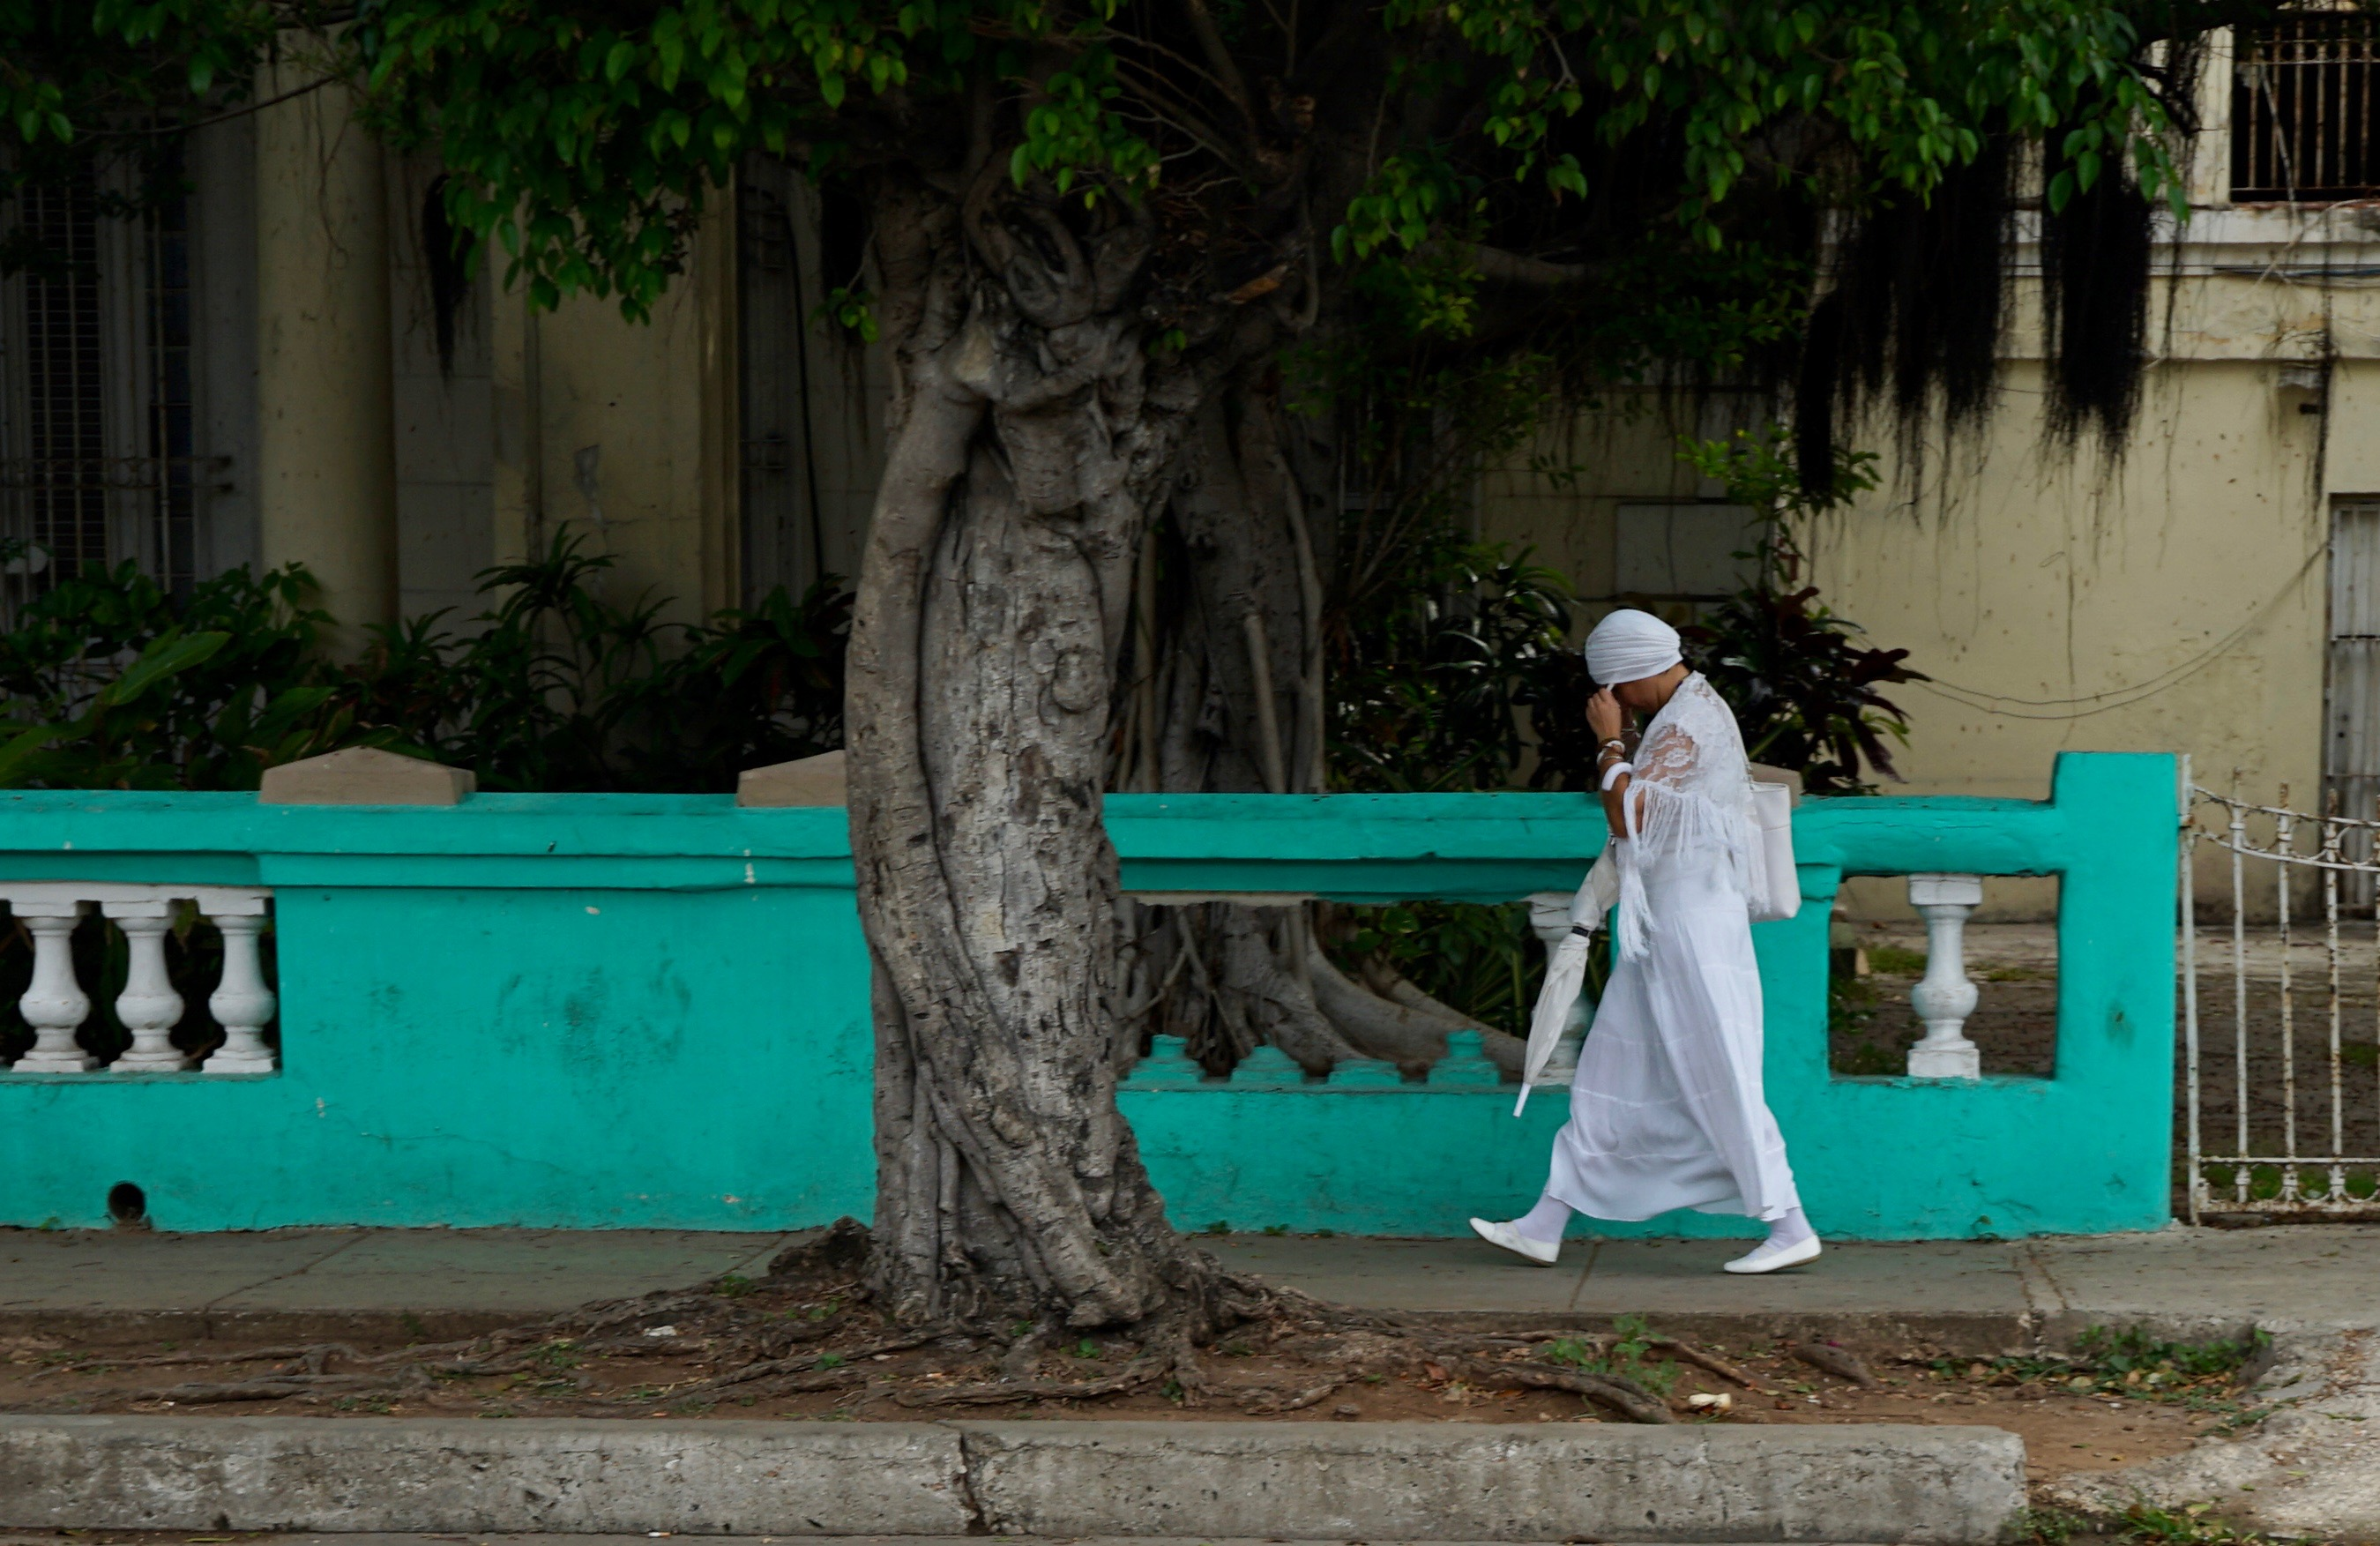 Mujer practicante Yoruba. La Habana